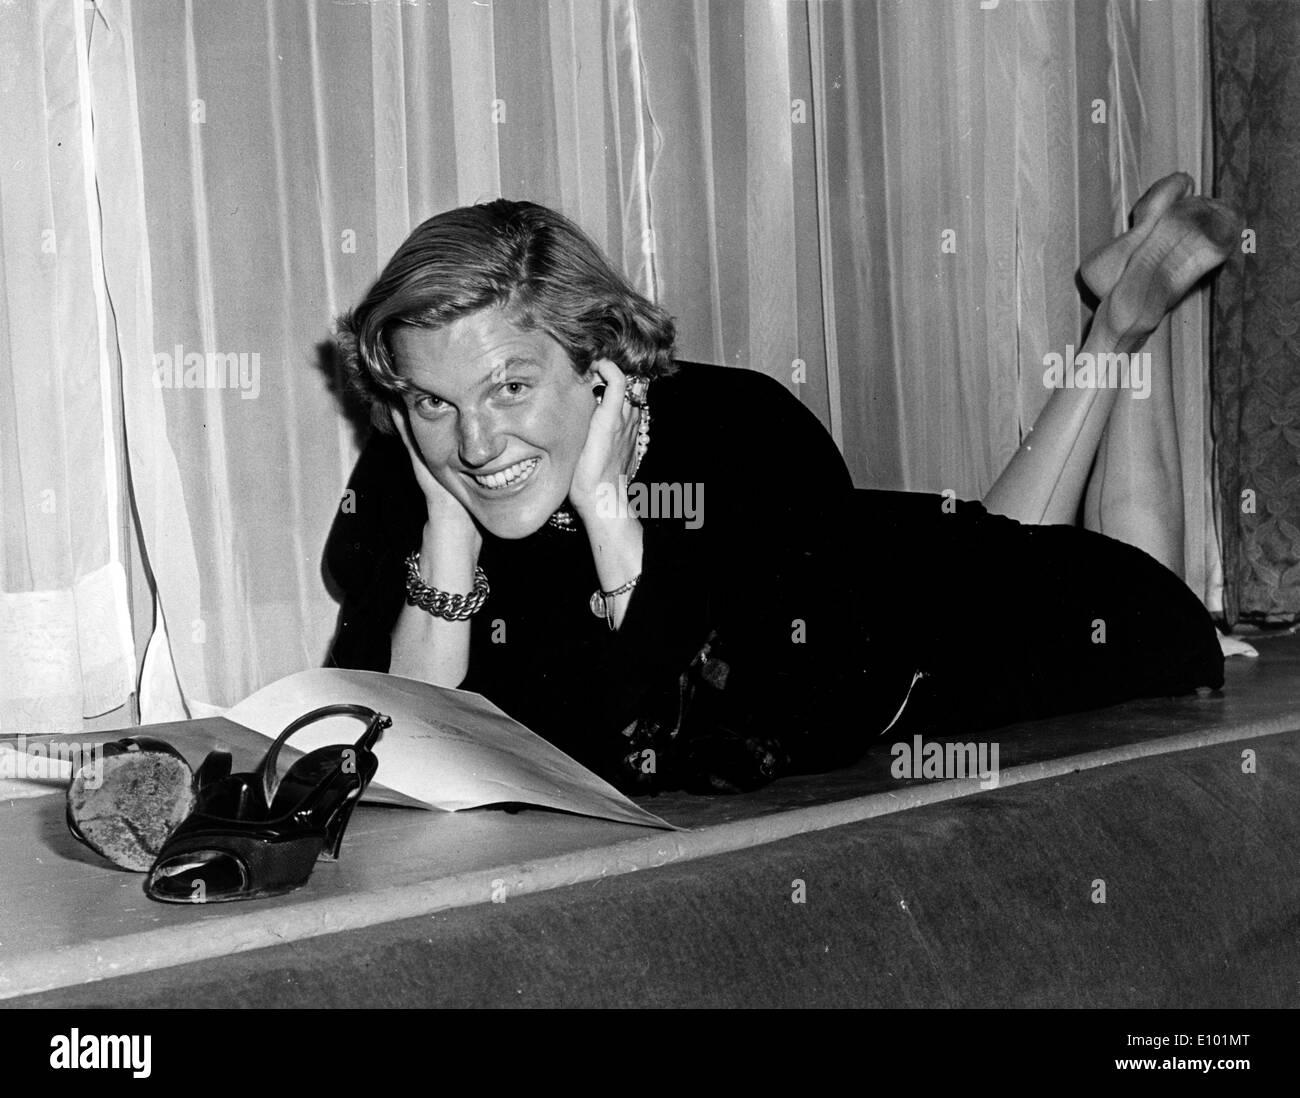 INGE BORKH is a German soprano singer born May 26, 1917. - Stock Image